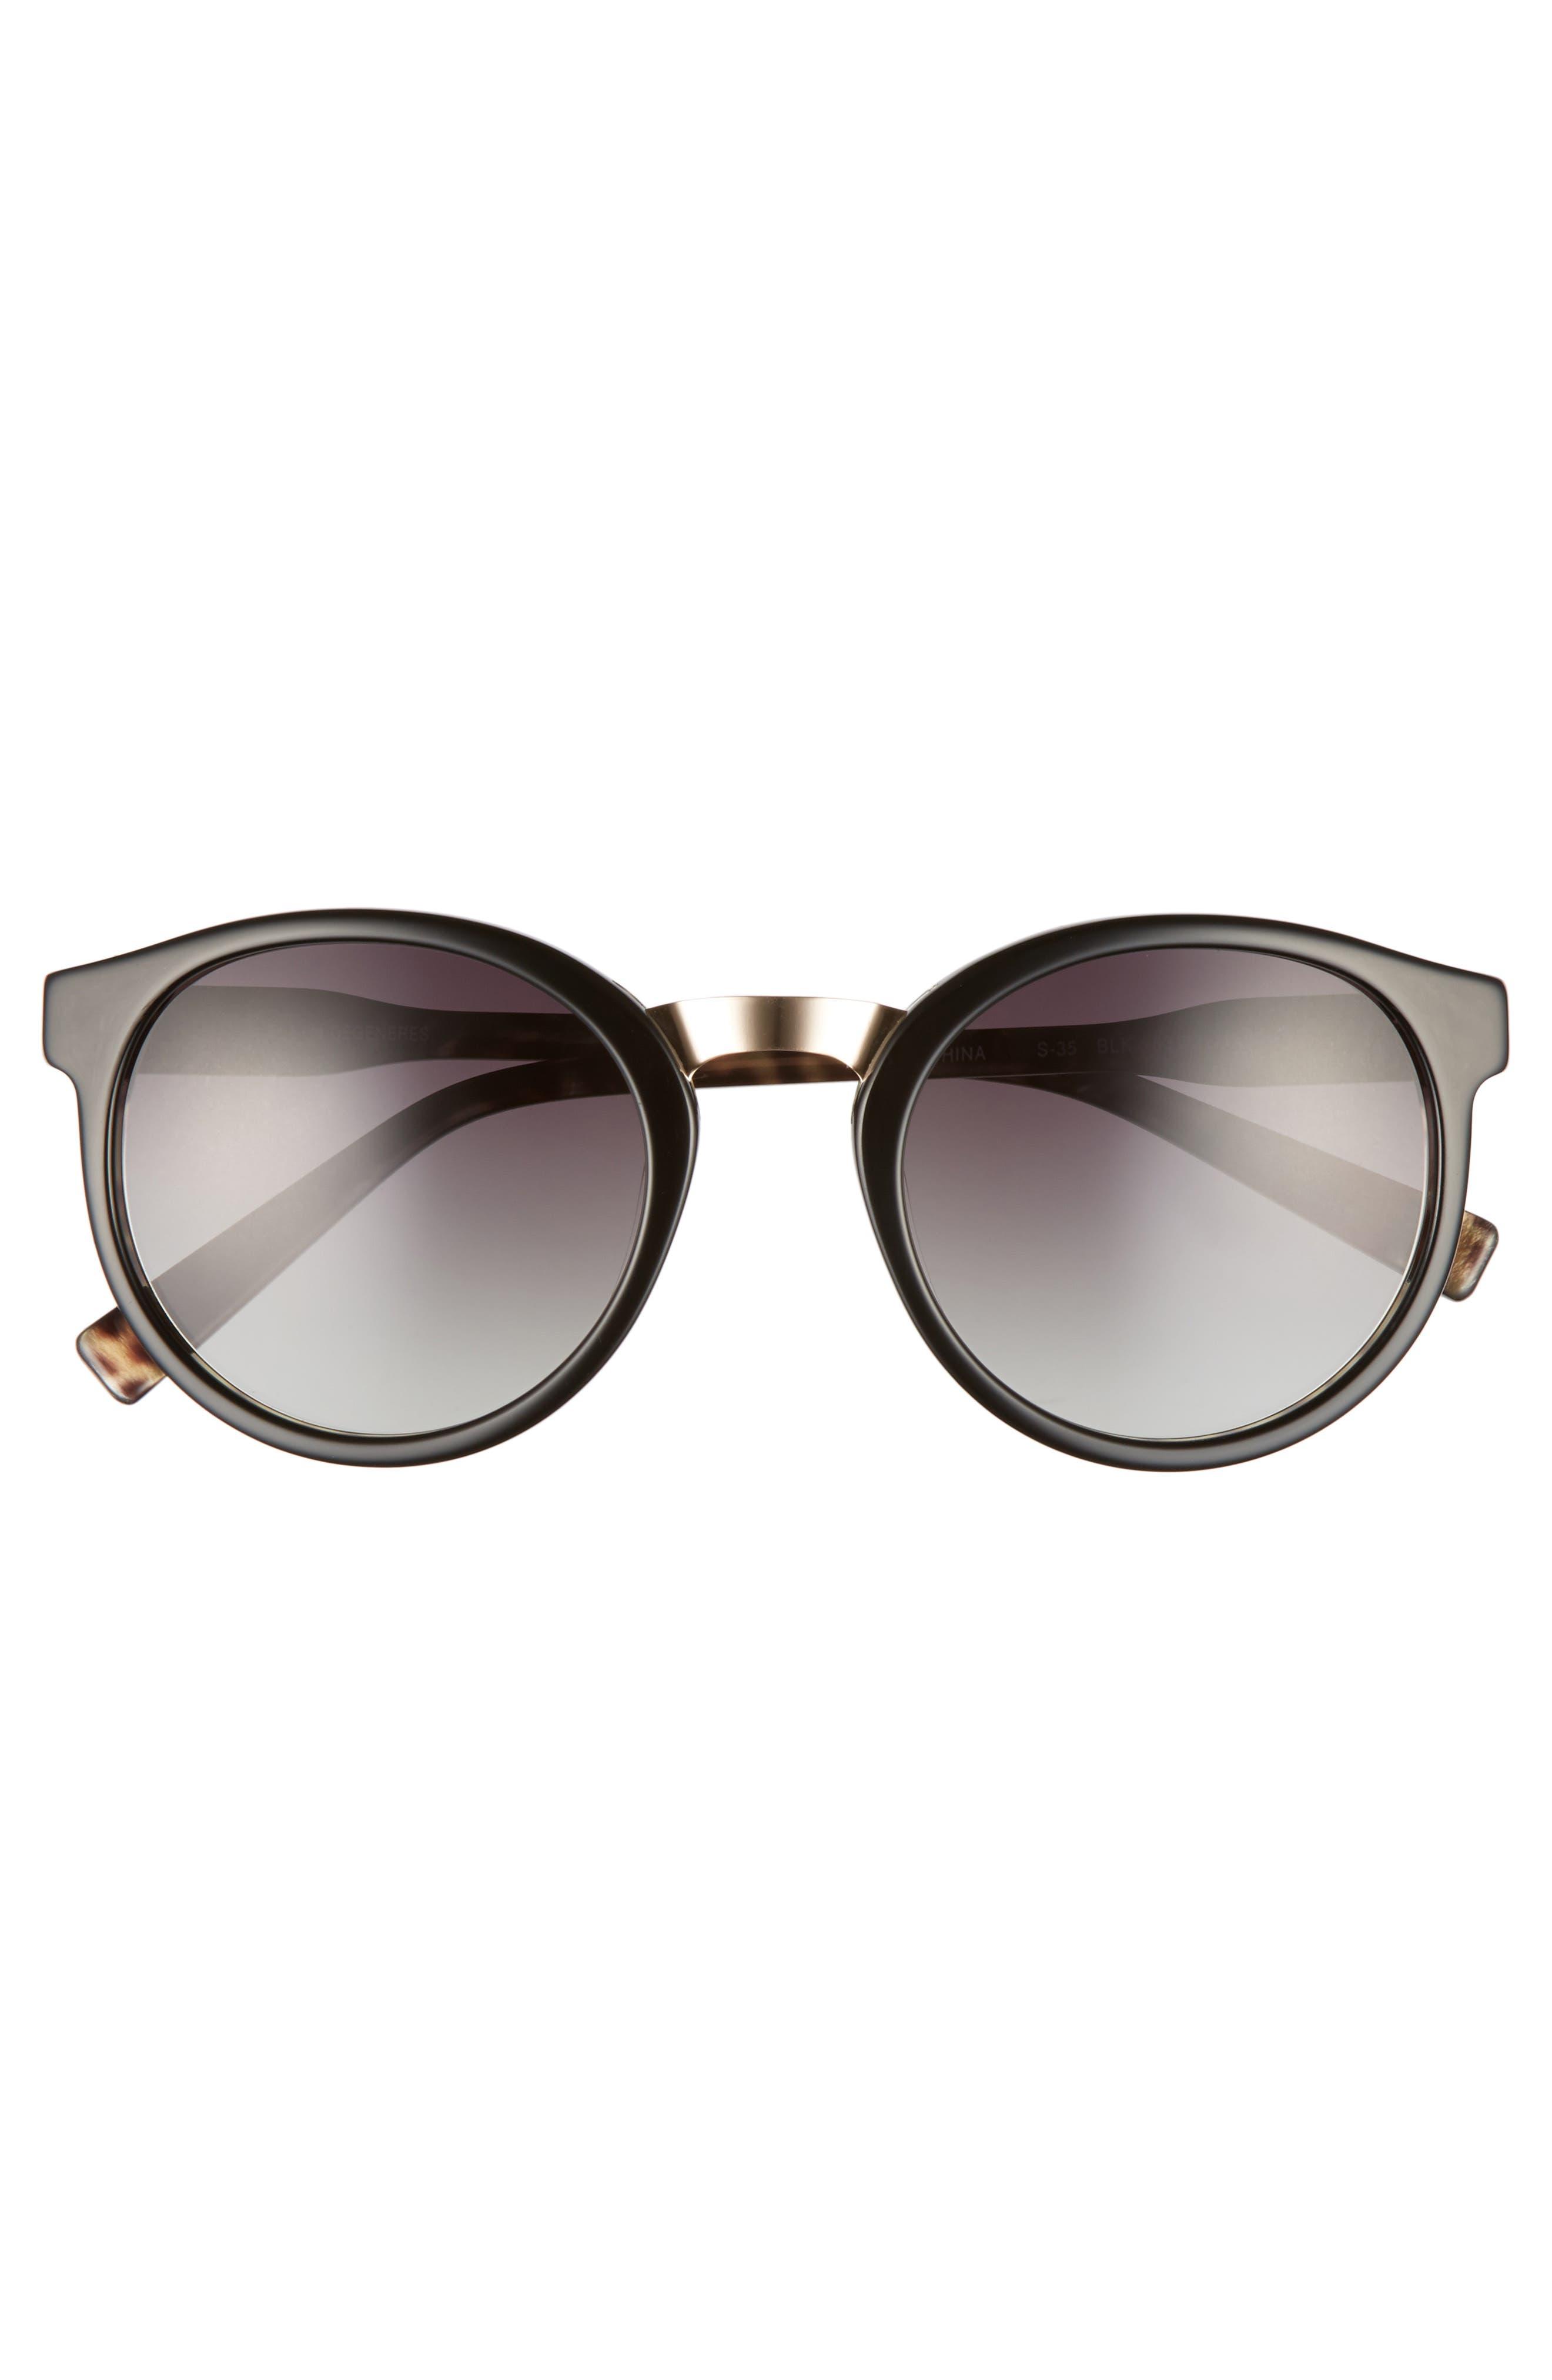 53mm Round Sunglasses,                             Alternate thumbnail 3, color,                             001